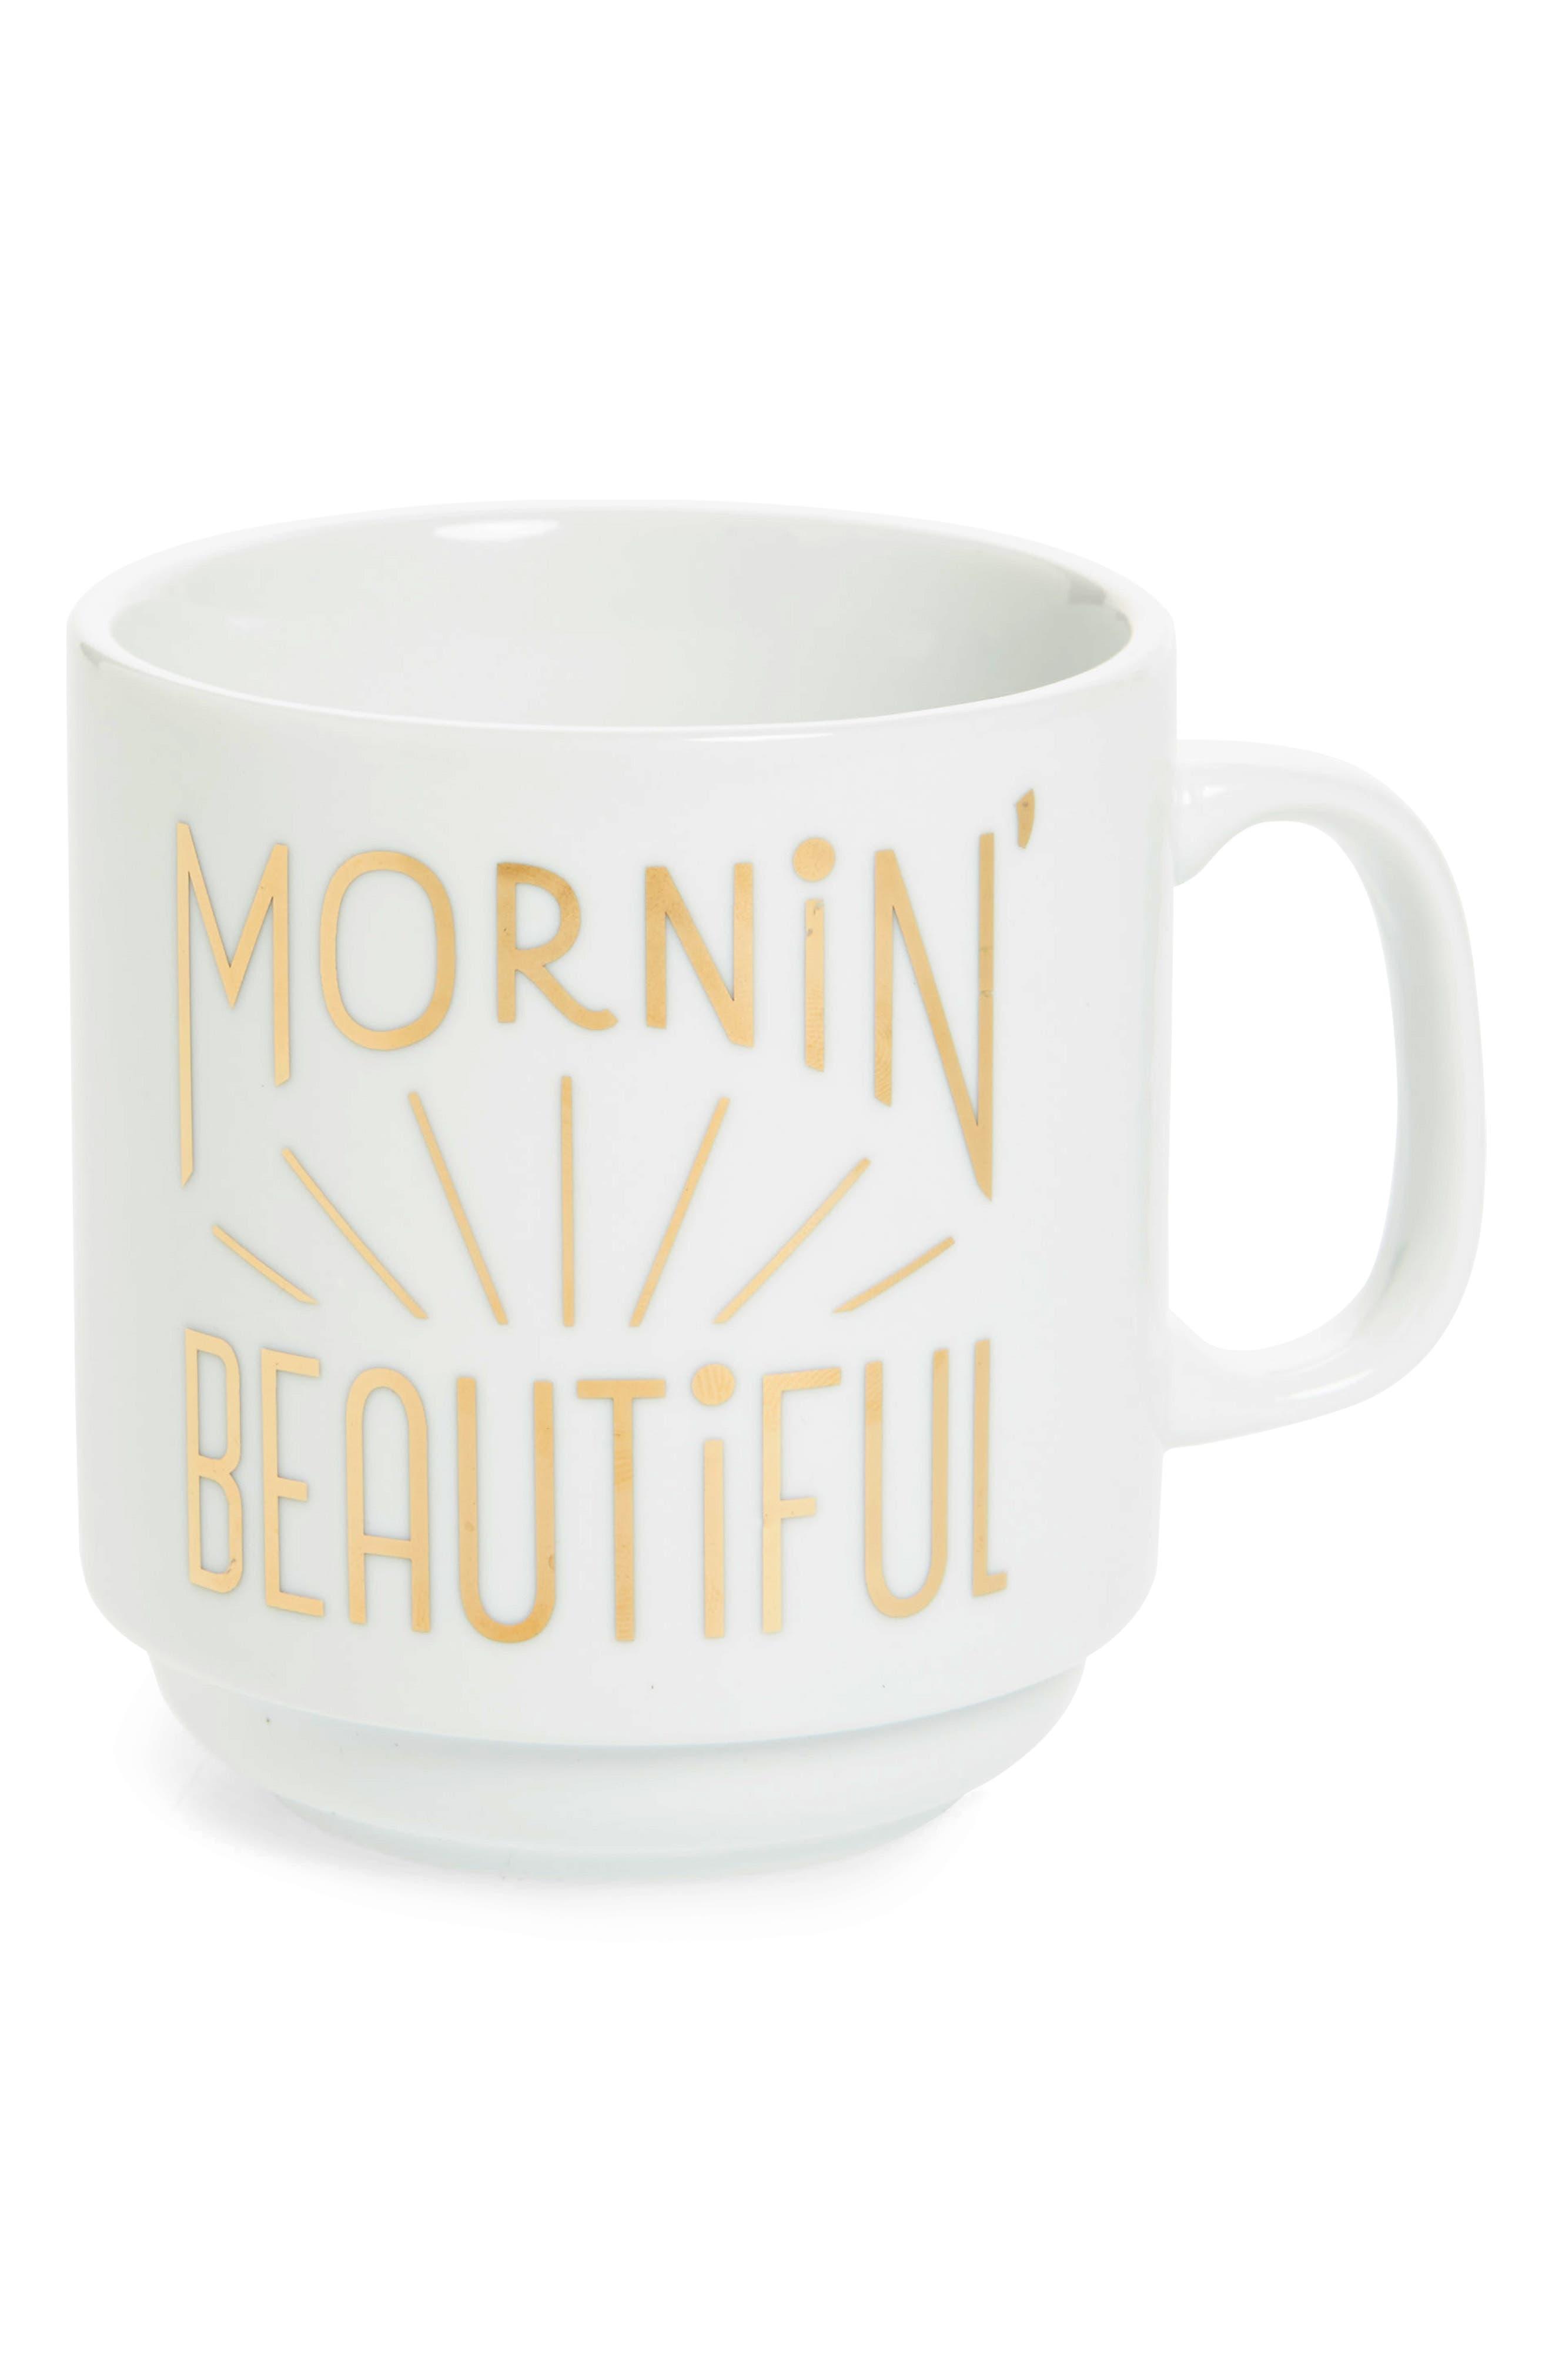 Easy, Tiger Mornin' Beautiful Mug